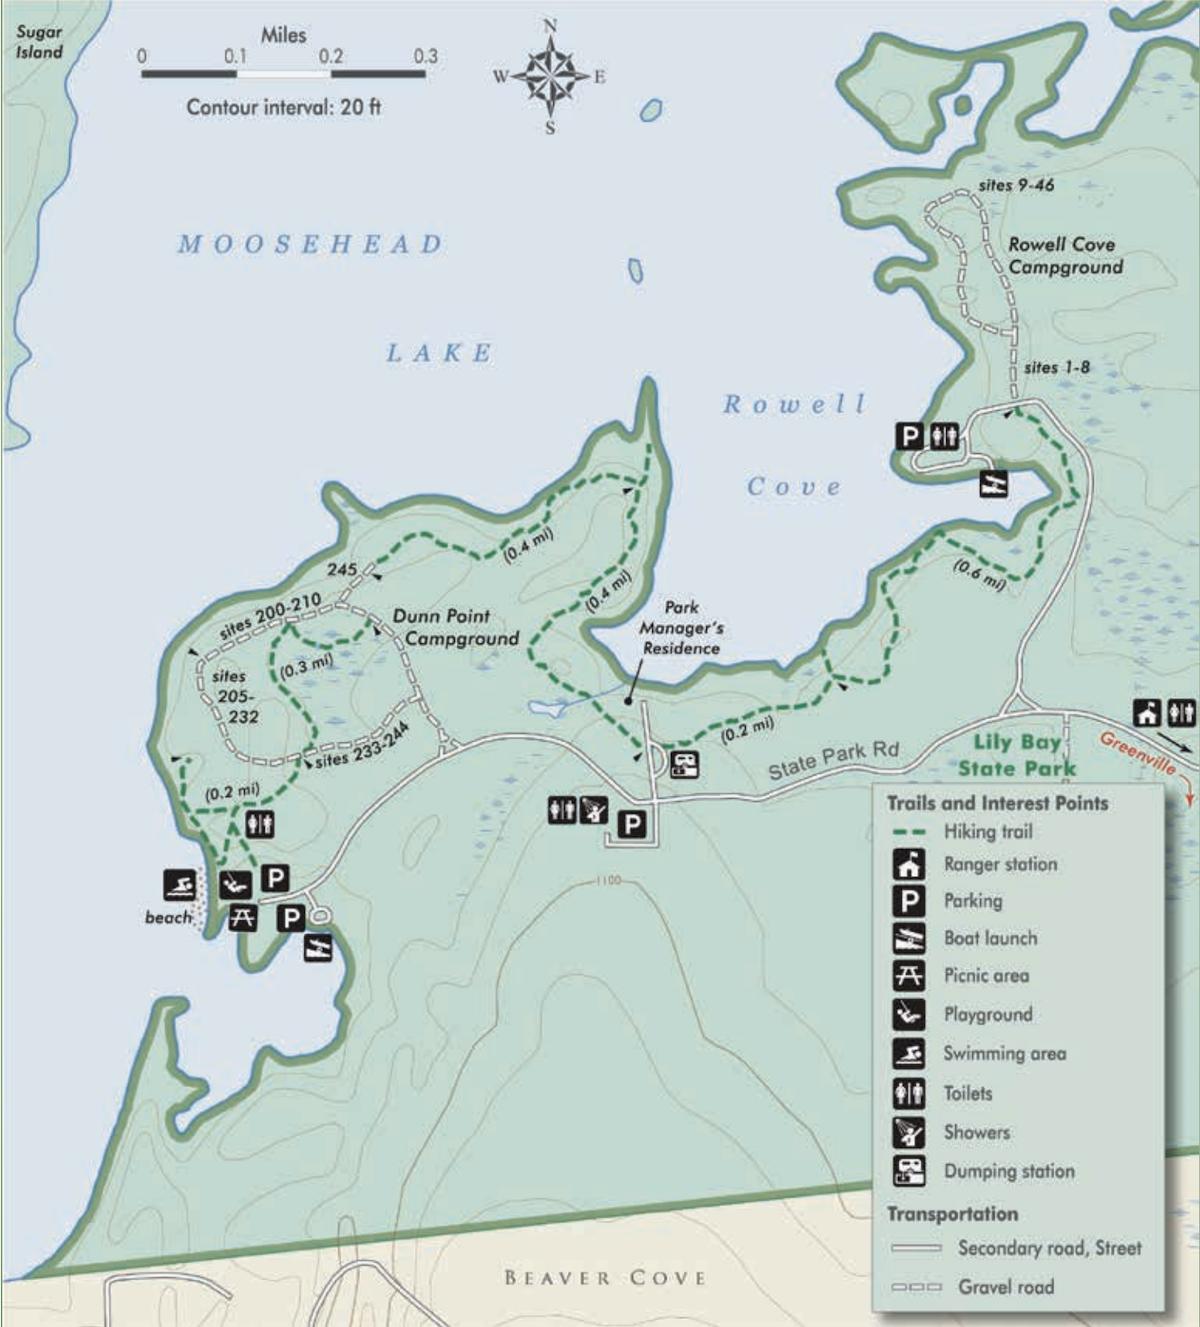 Lily Bay State Park, near Greenville - Maine by Foot Lilly Bay State Park on popham beach state park, northfield state park, hudson state park, ludlow state park, guilford state park, monticello state park, roque bluffs state park, mount blue state park, reid state park, quoddy head state park, sebago lake state park, moose point state park, oxford state park, naples state park, aroostook state park, lewiston state park, camden hills state park, baxter state park, warren island state park, wolfe's neck woods state park, cobscook bay state park, damariscotta lake state park, two lights state park, lamoine state park, bradbury mountain state park, ferry beach state park, plymouth state park, rangeley lake state park, crescent beach state park, grafton notch state park,